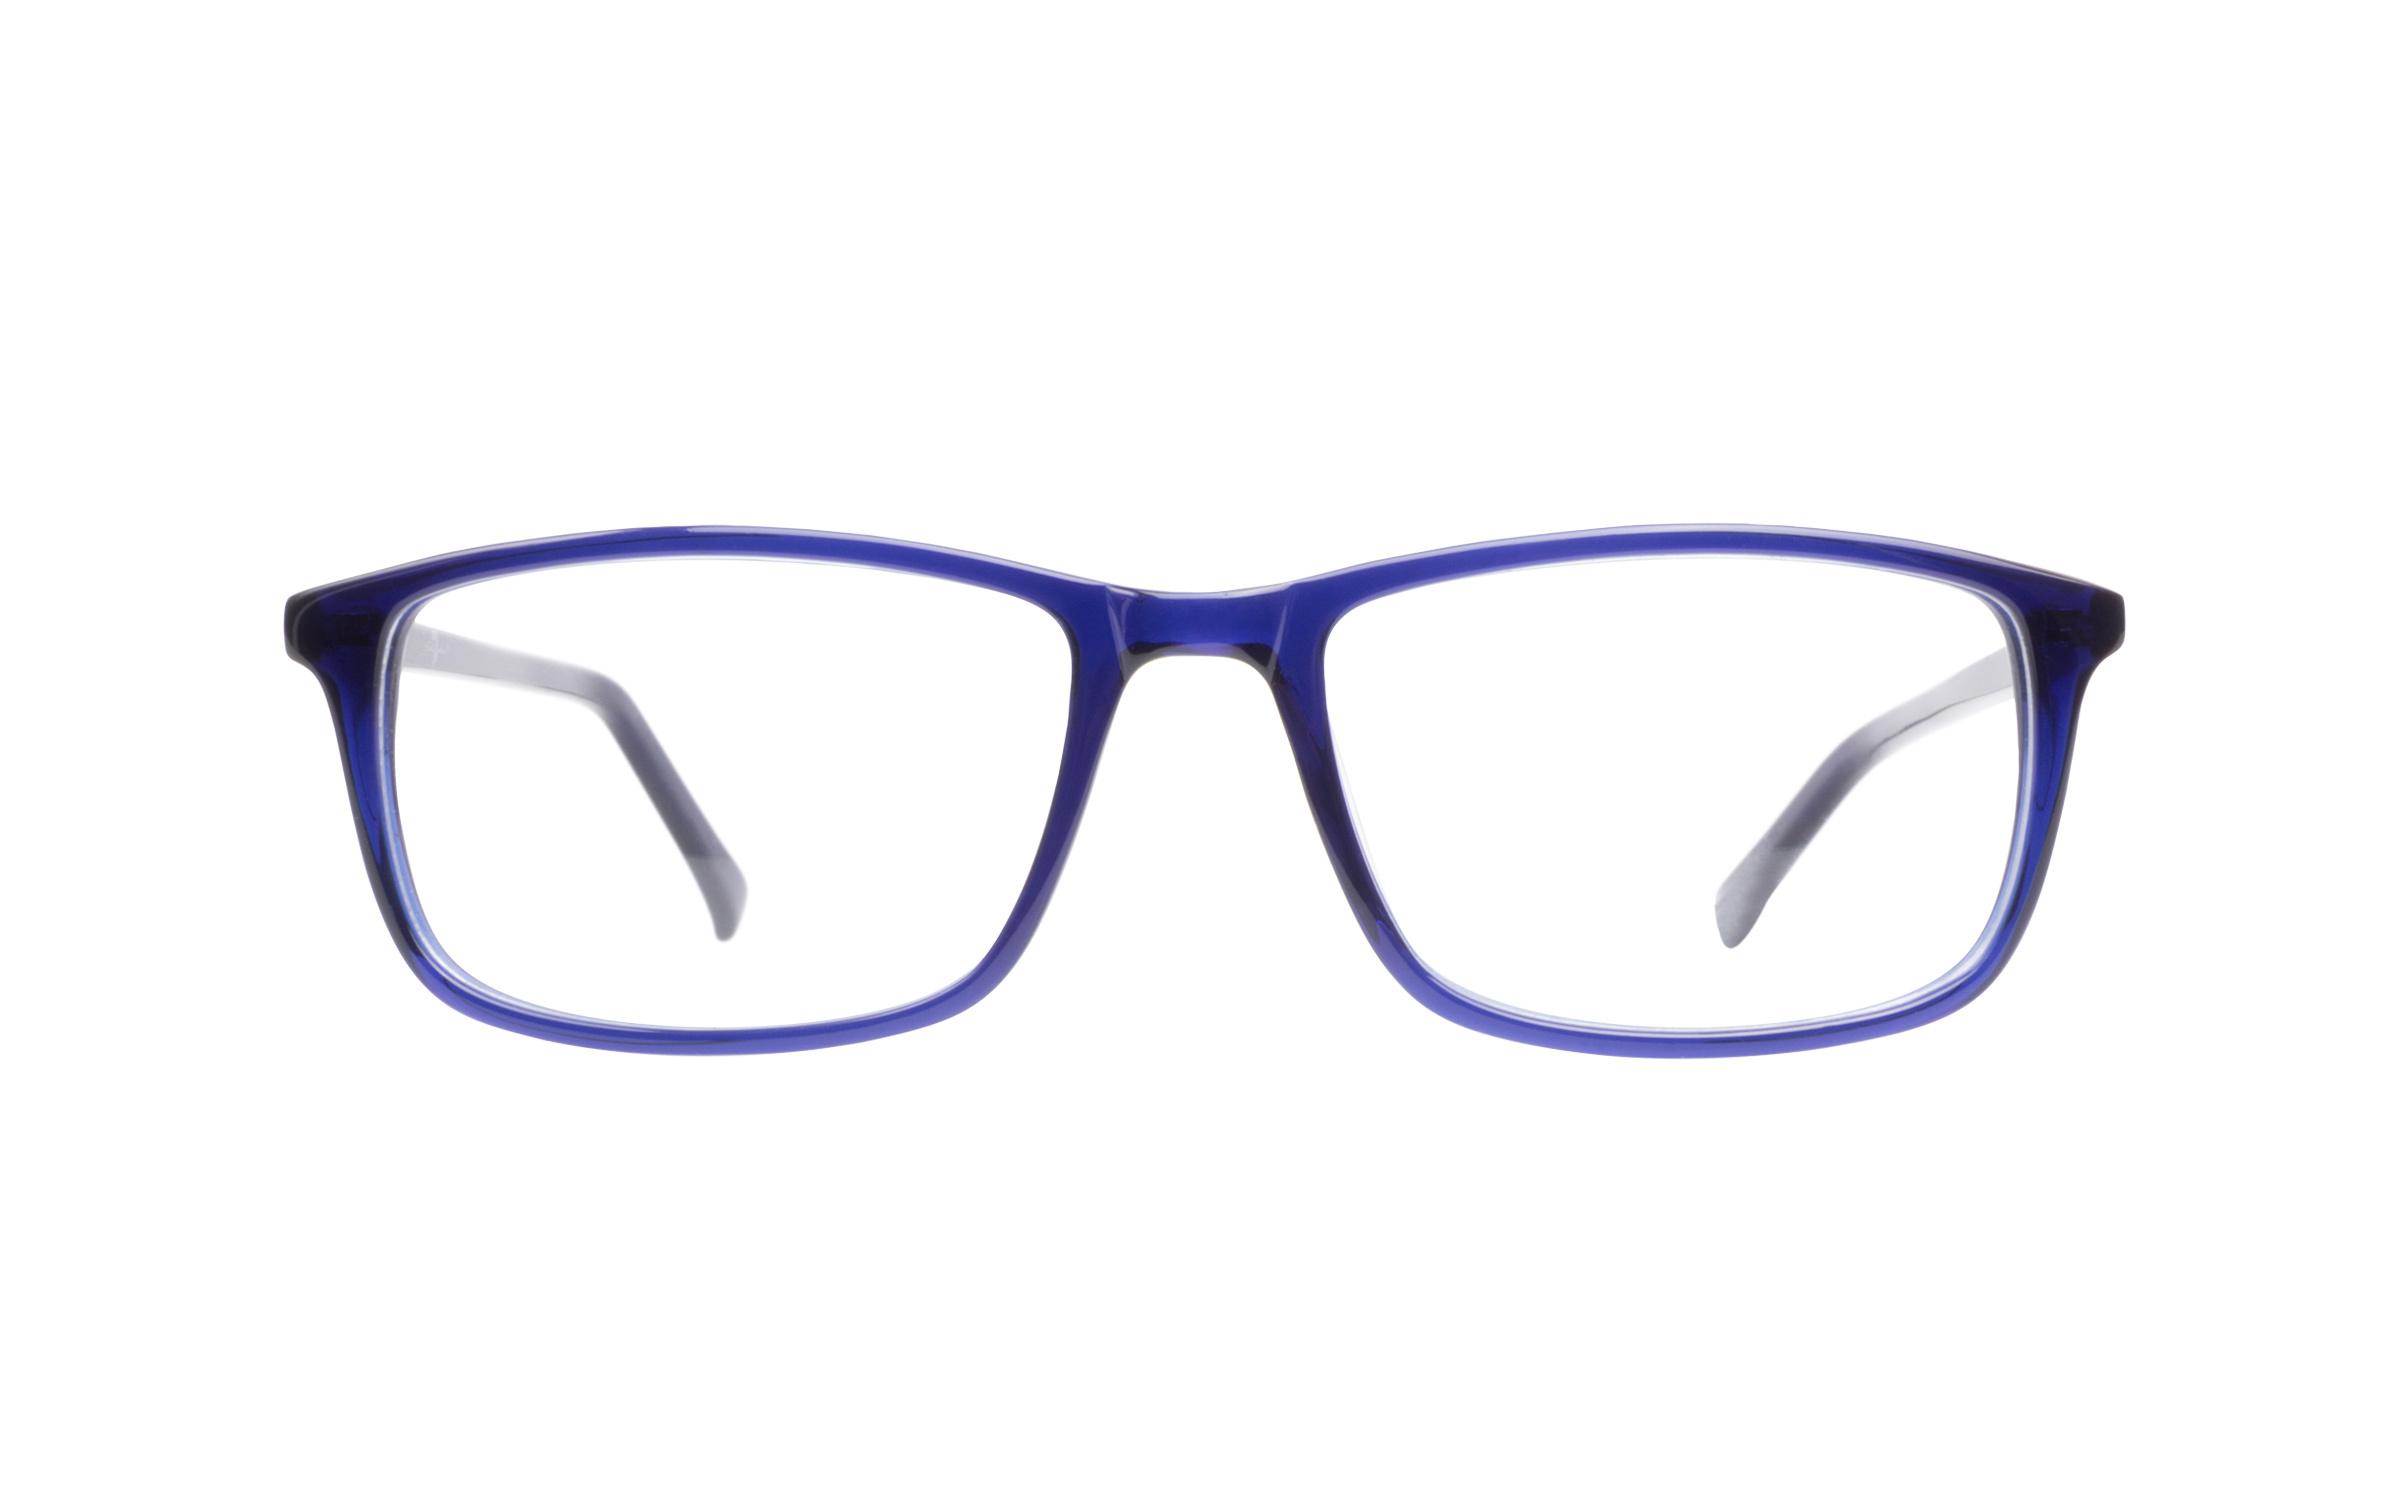 Mens_Rectangular_Glasses_Blue_7_for_All_Mankind_Online_Coastal